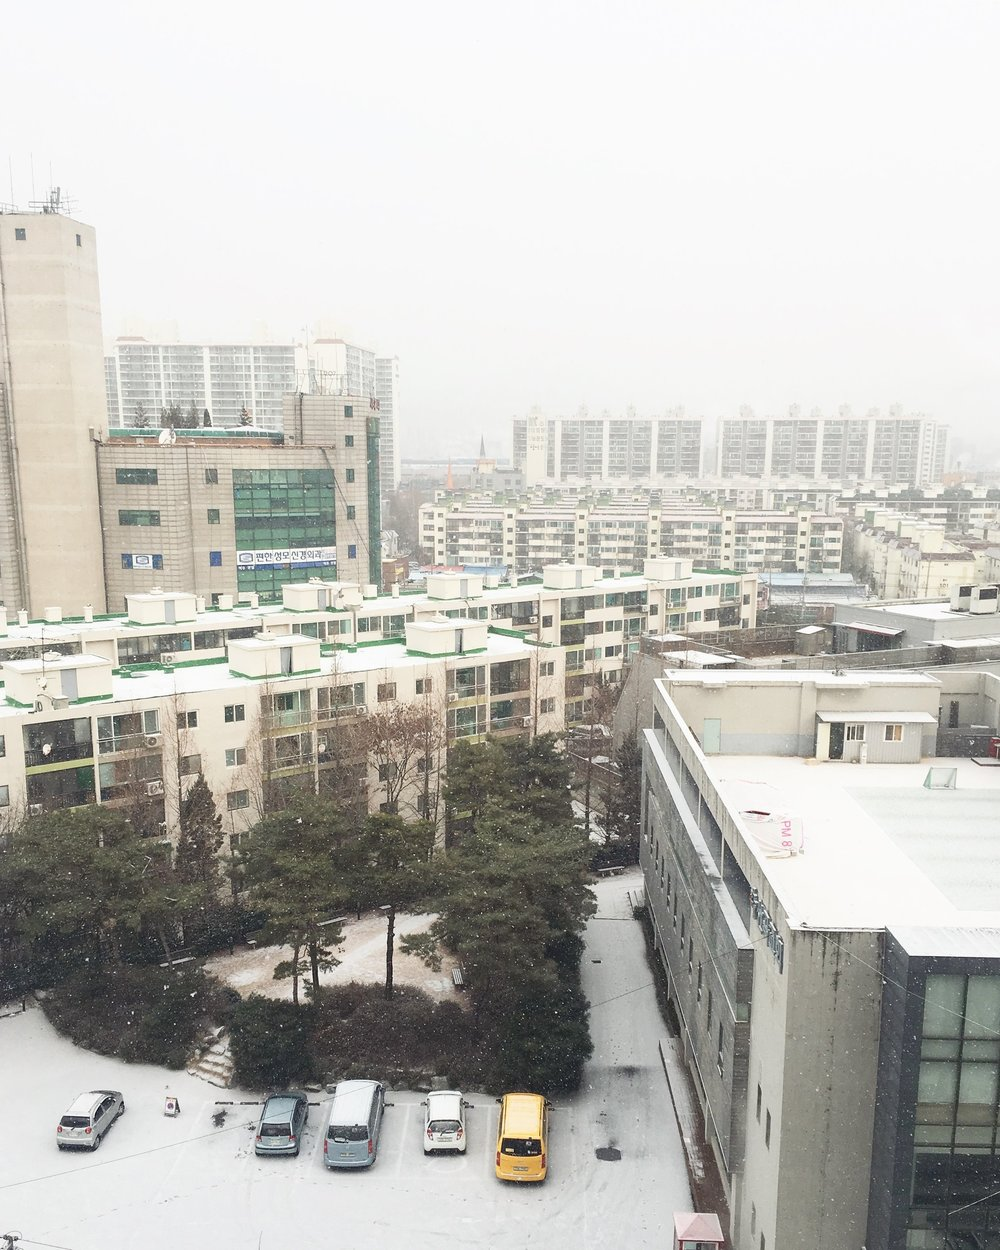 Seoul, Korea |Jan 2017